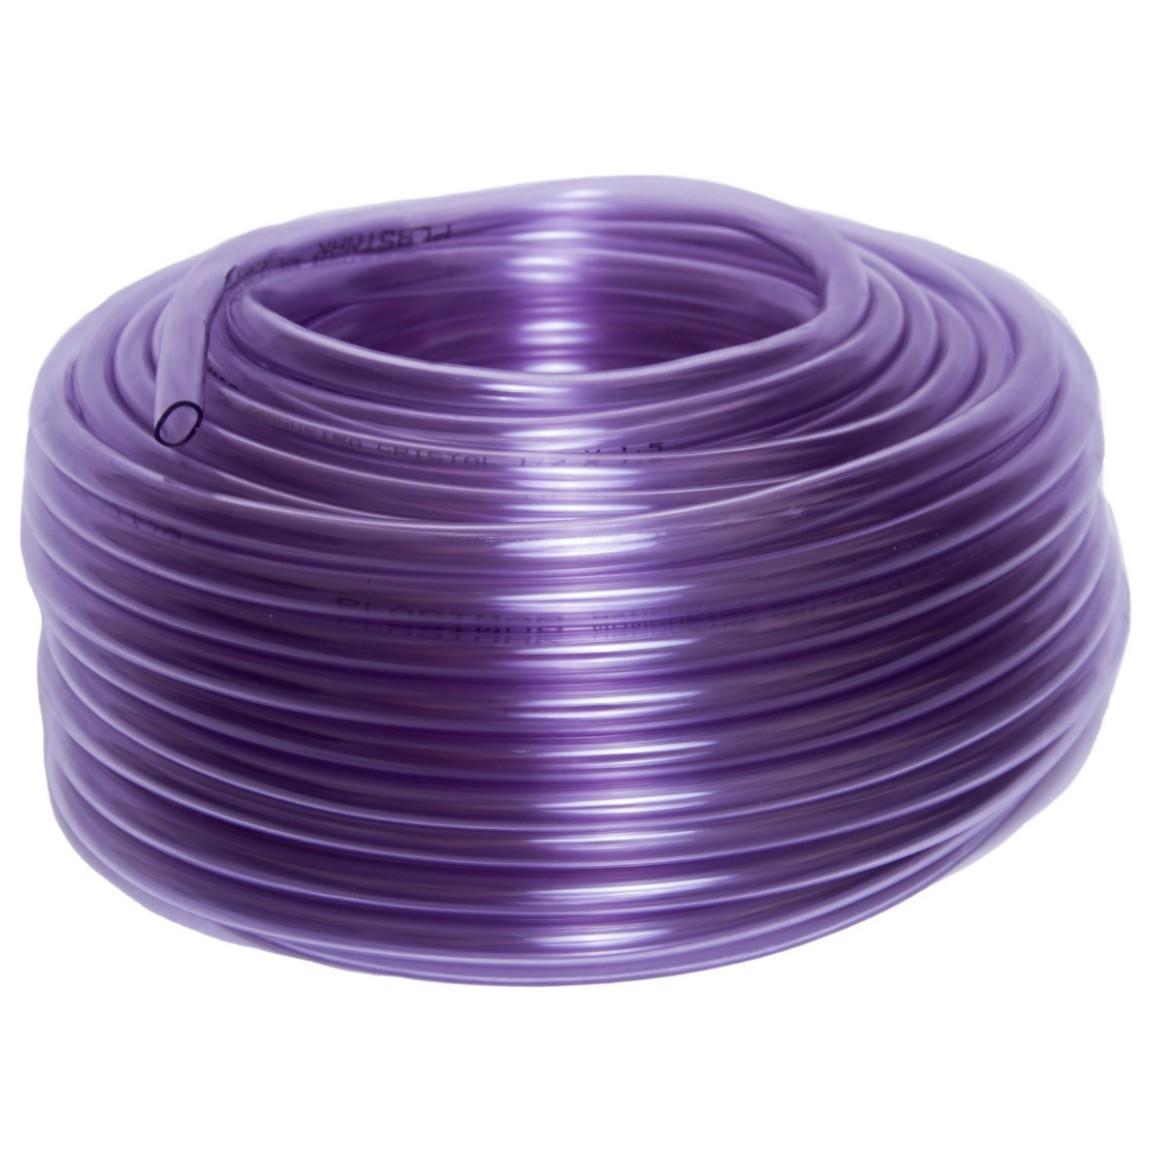 Mangueira de PVC 10m 14 Roxa 788 - Plastmar